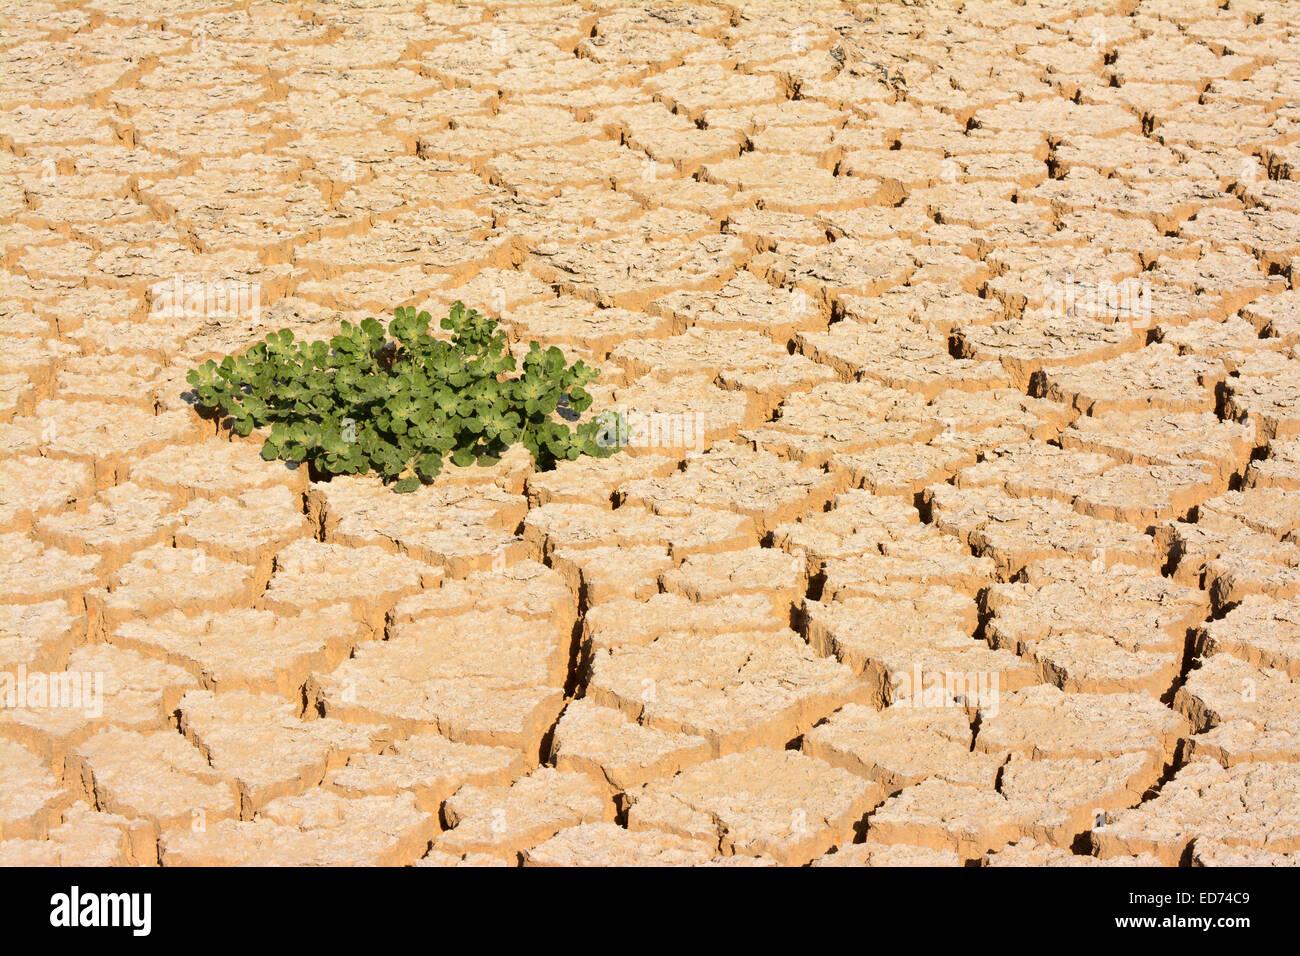 Dry soil, new life - Stock Image